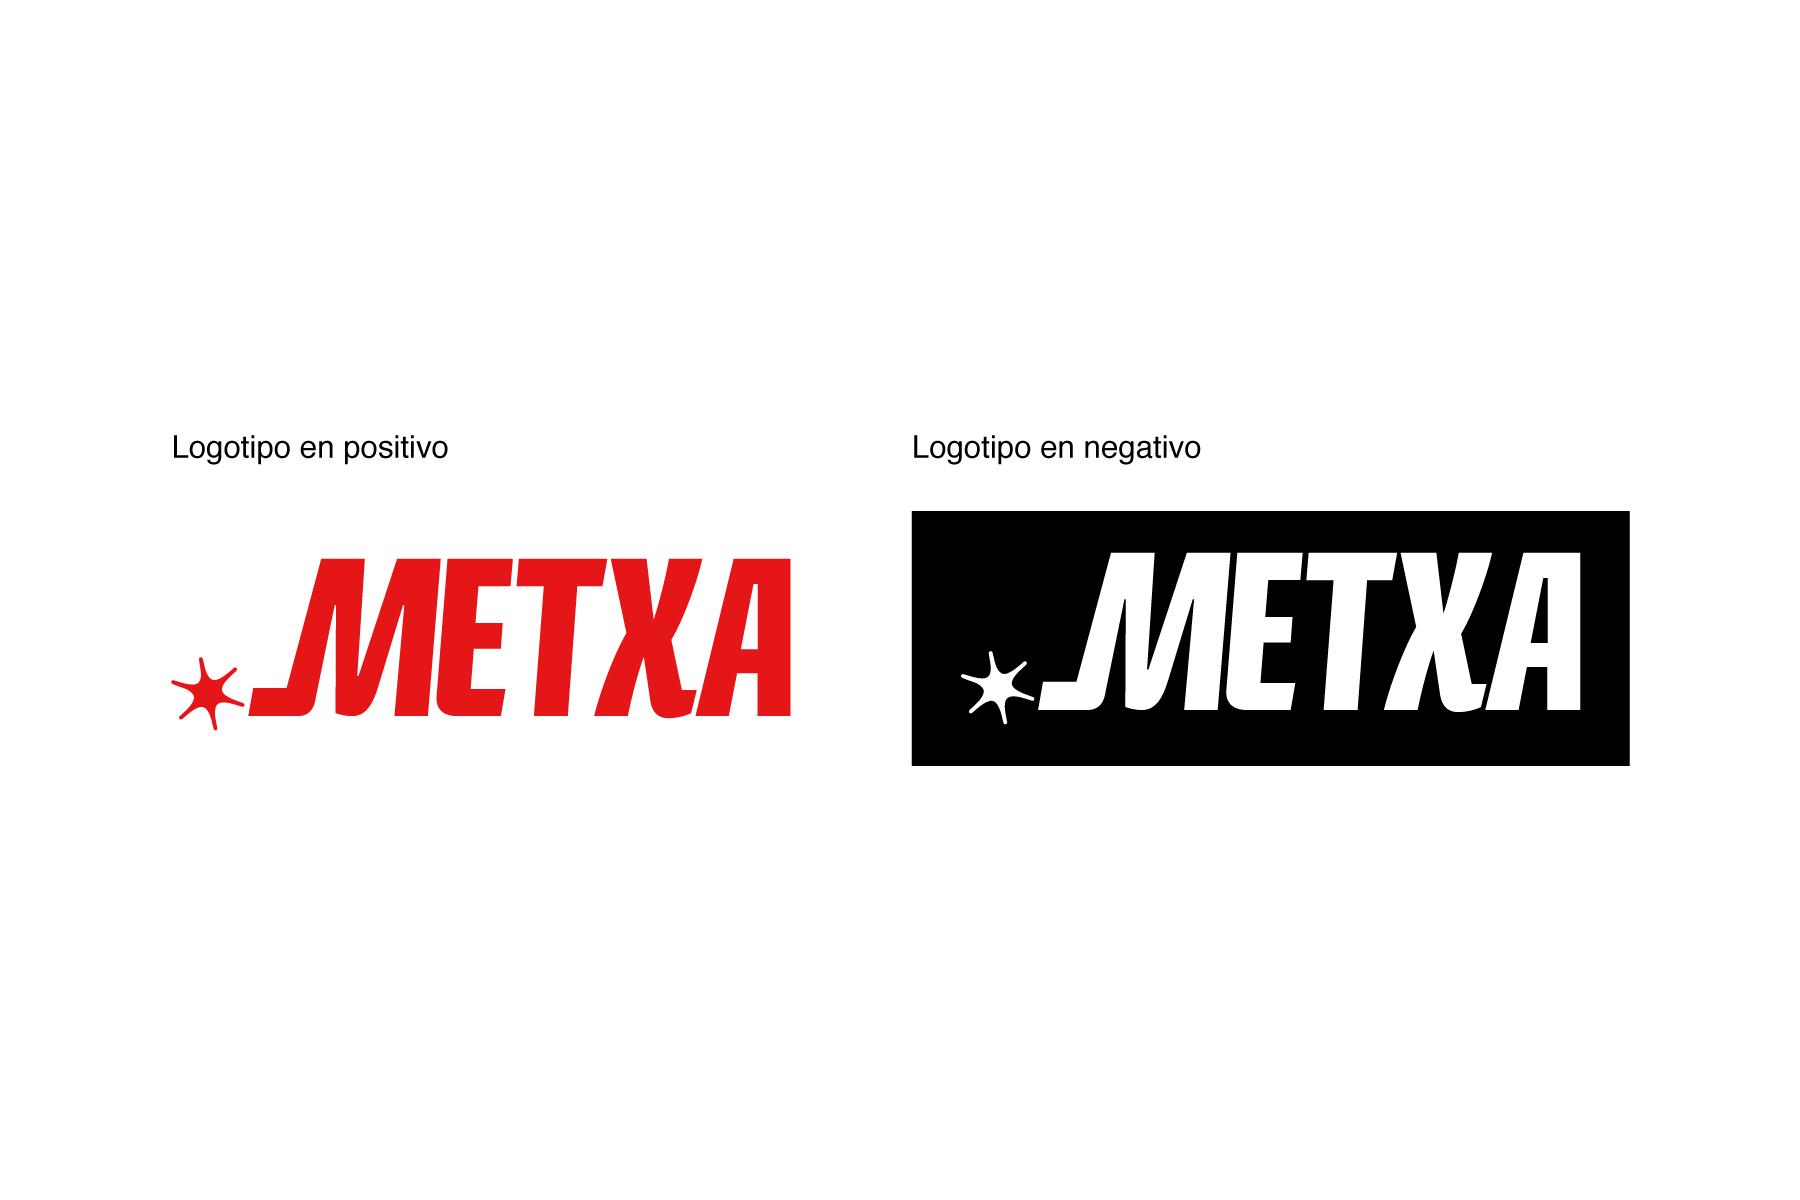 METXA